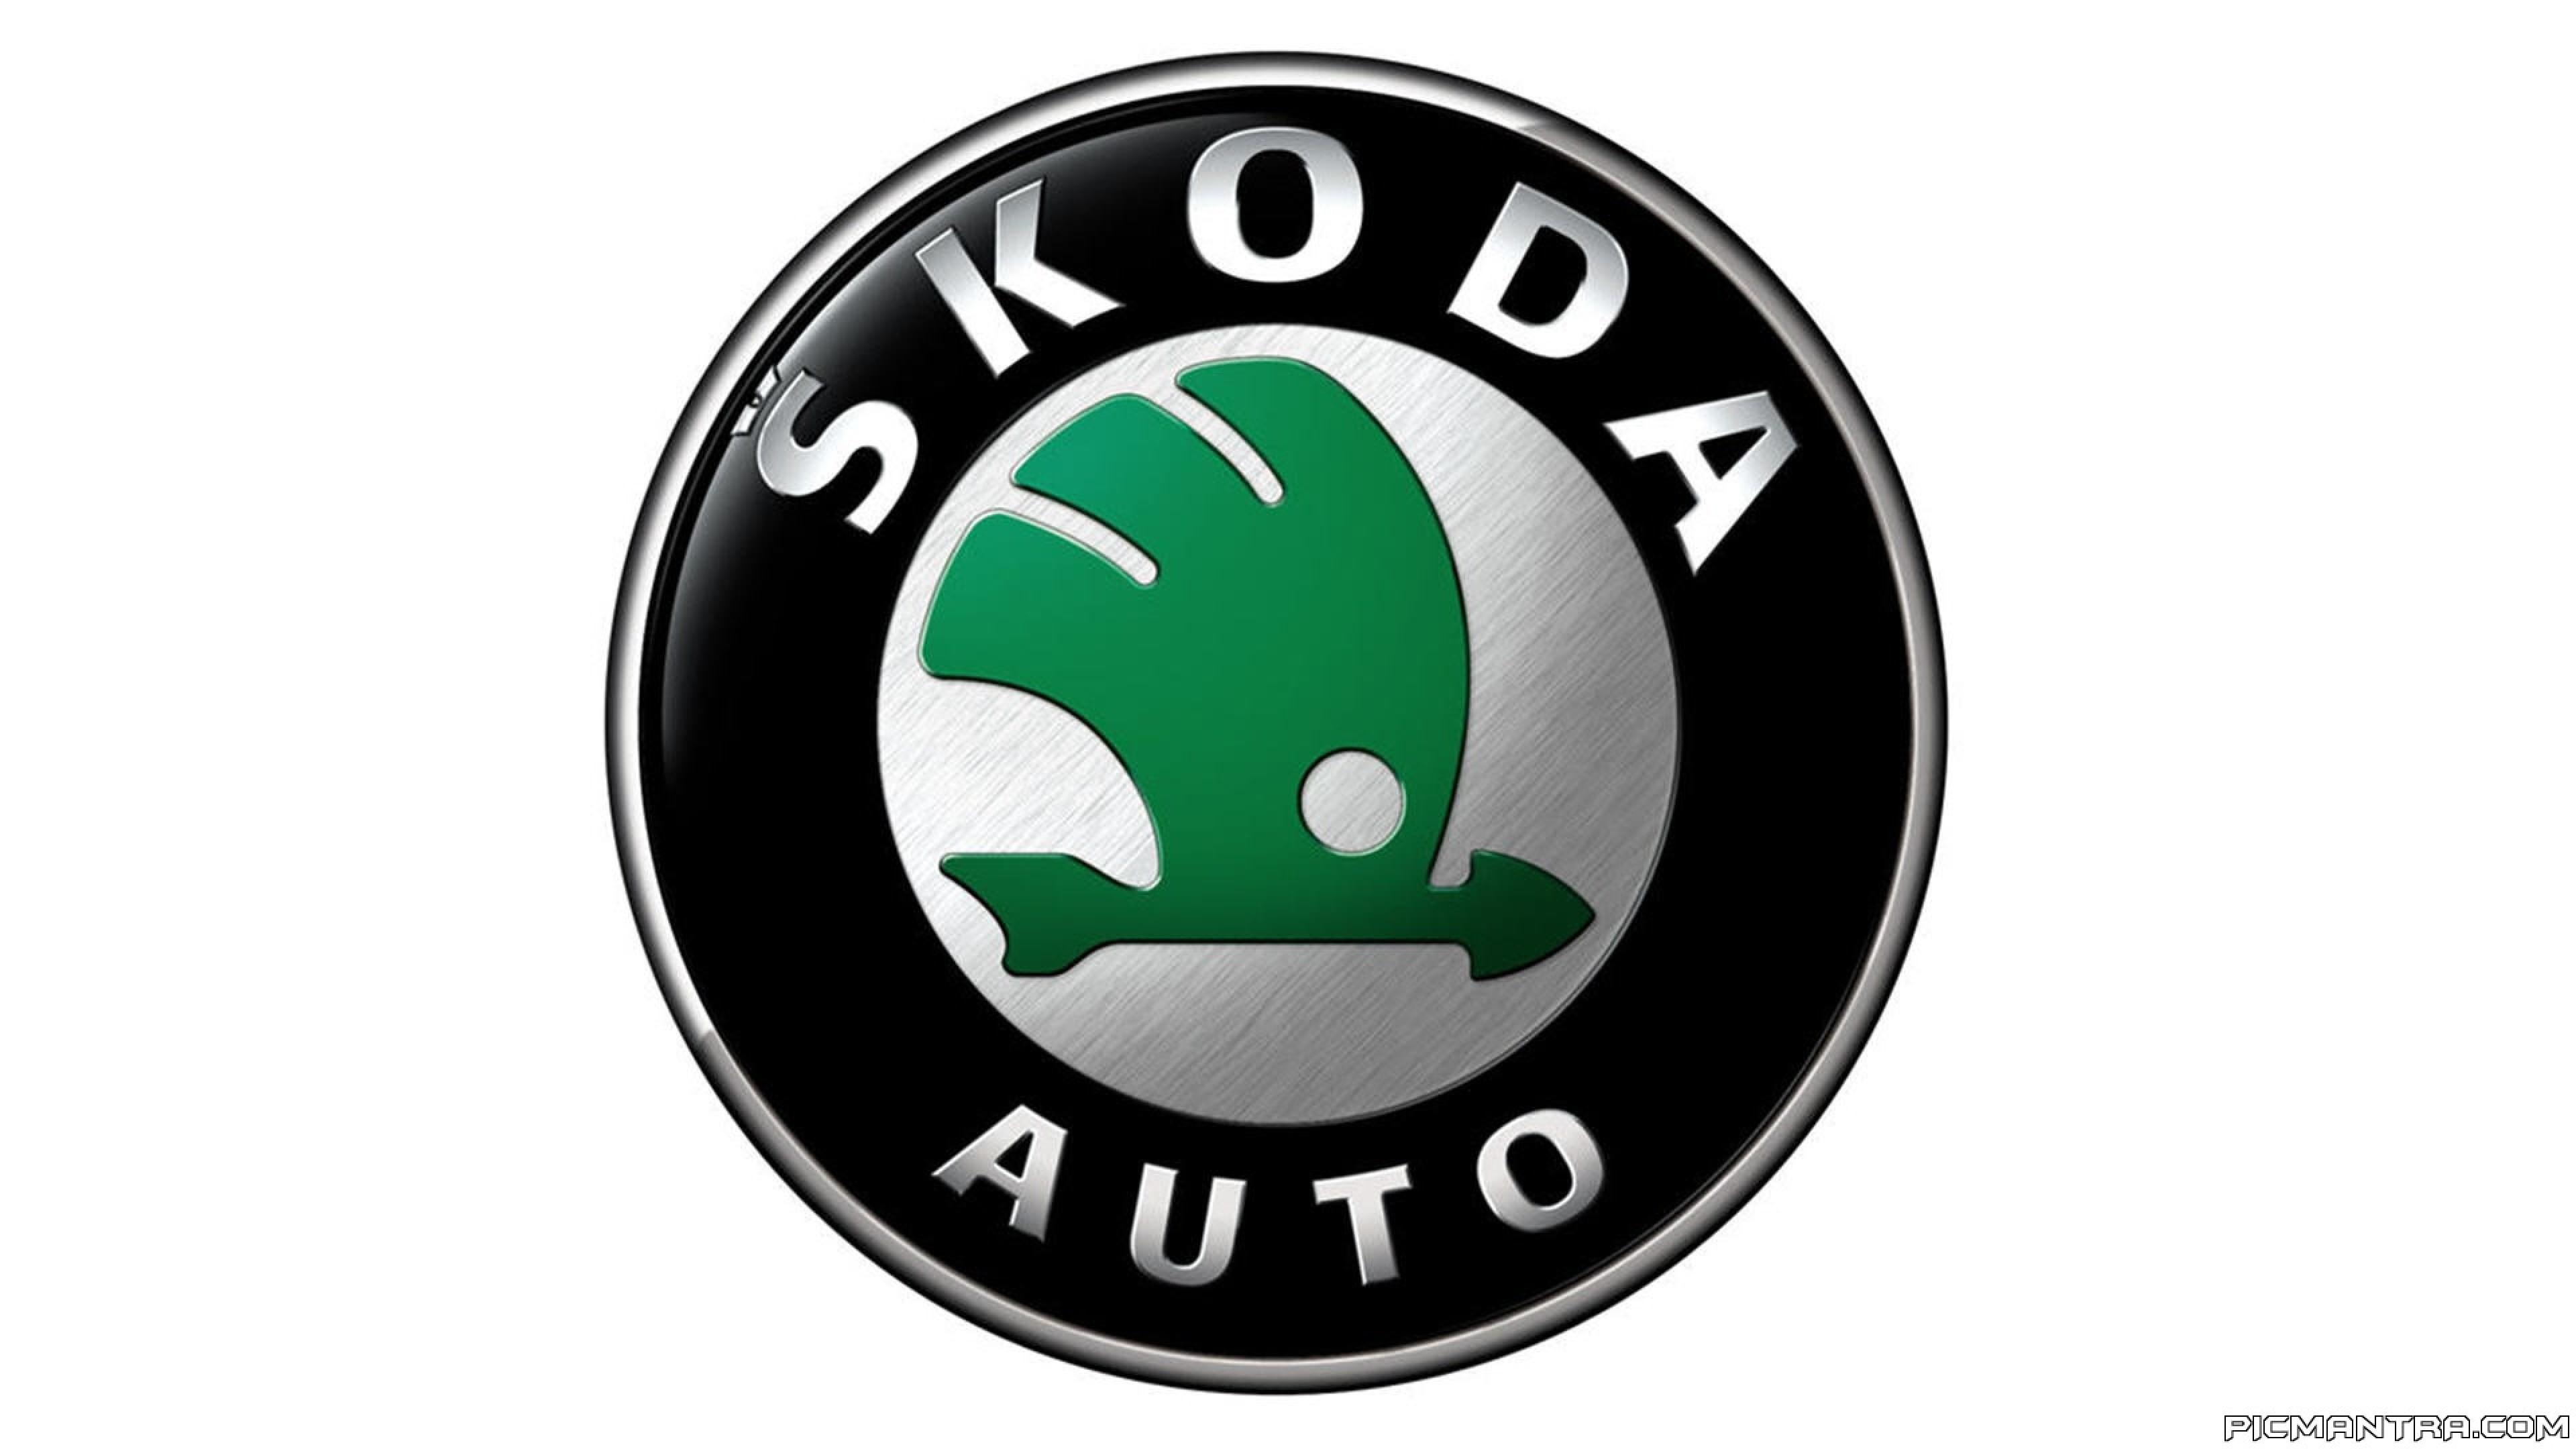 Skoda logo hd wallpaper wallpapers trend for Wallpaper on trend